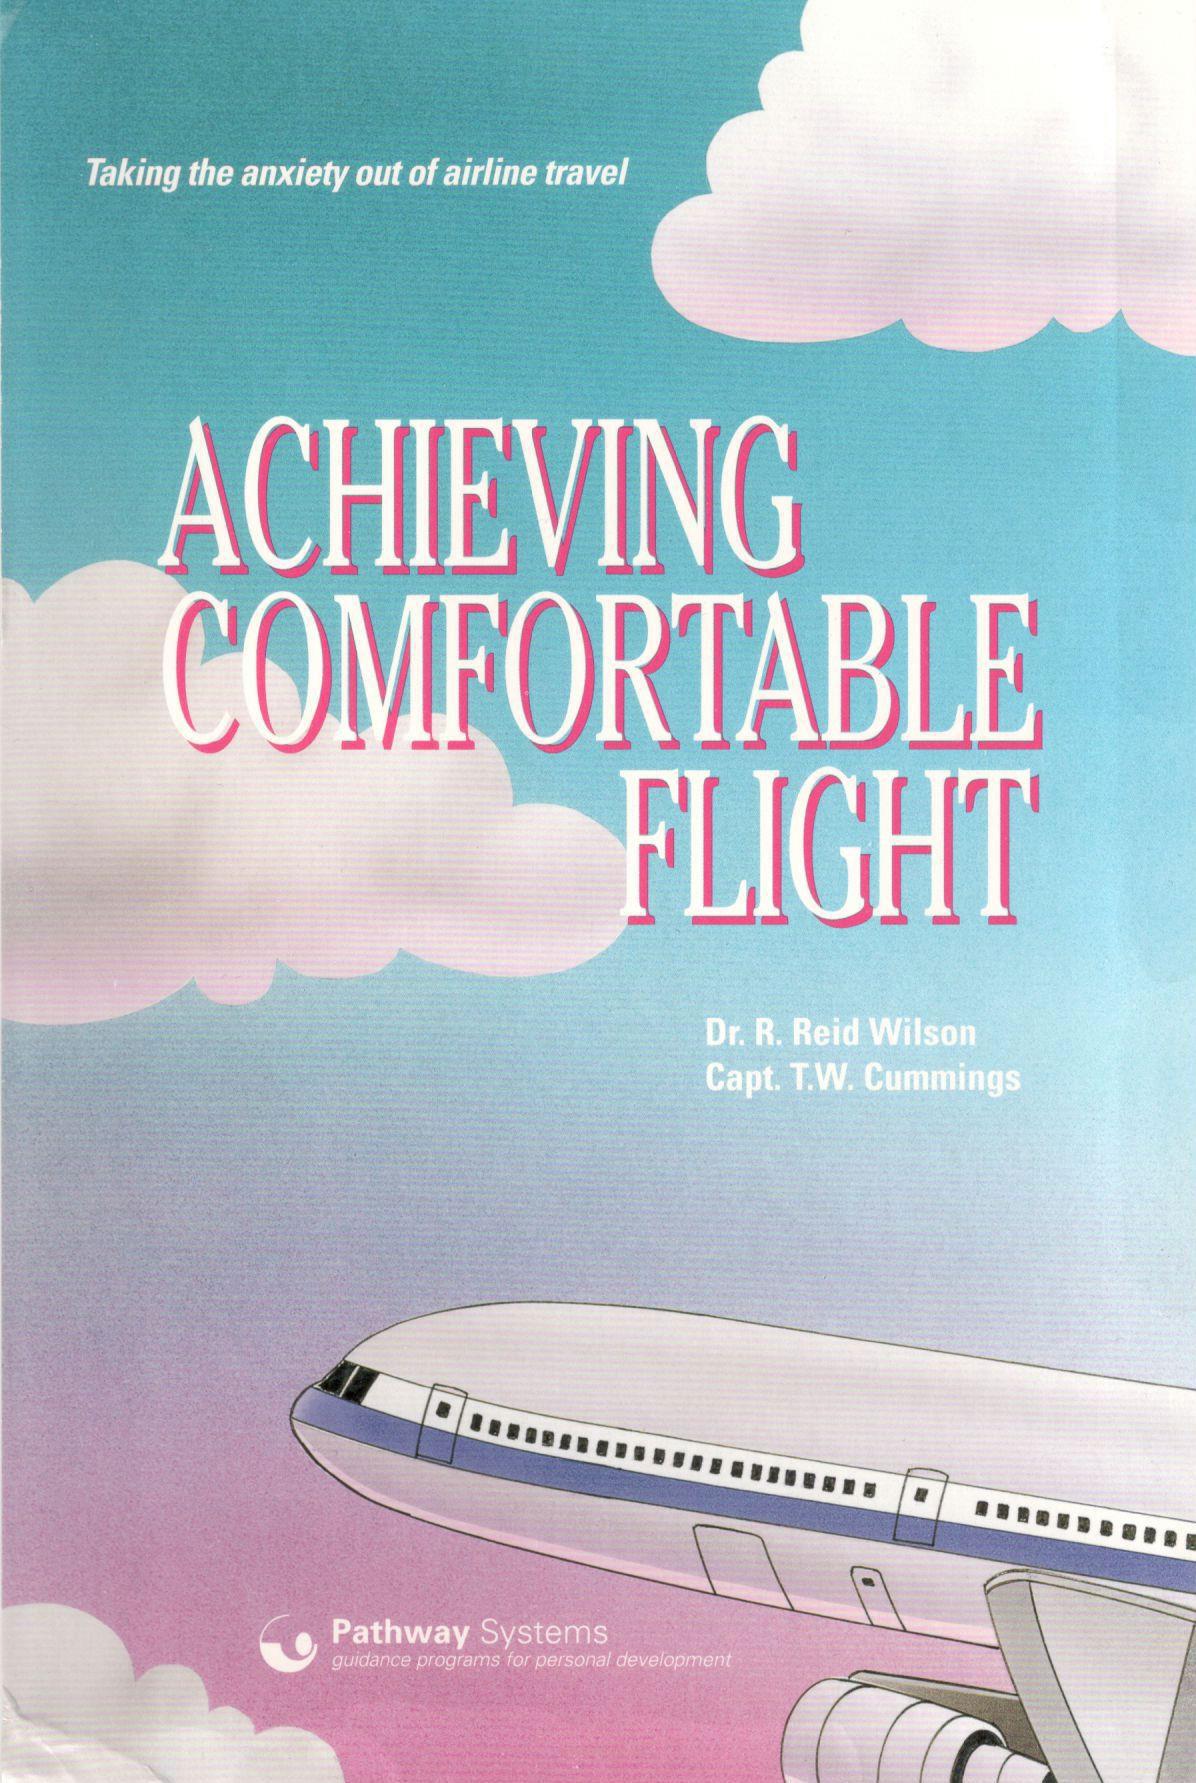 reid-wilson-book-cover-achieving-comfortable-flight